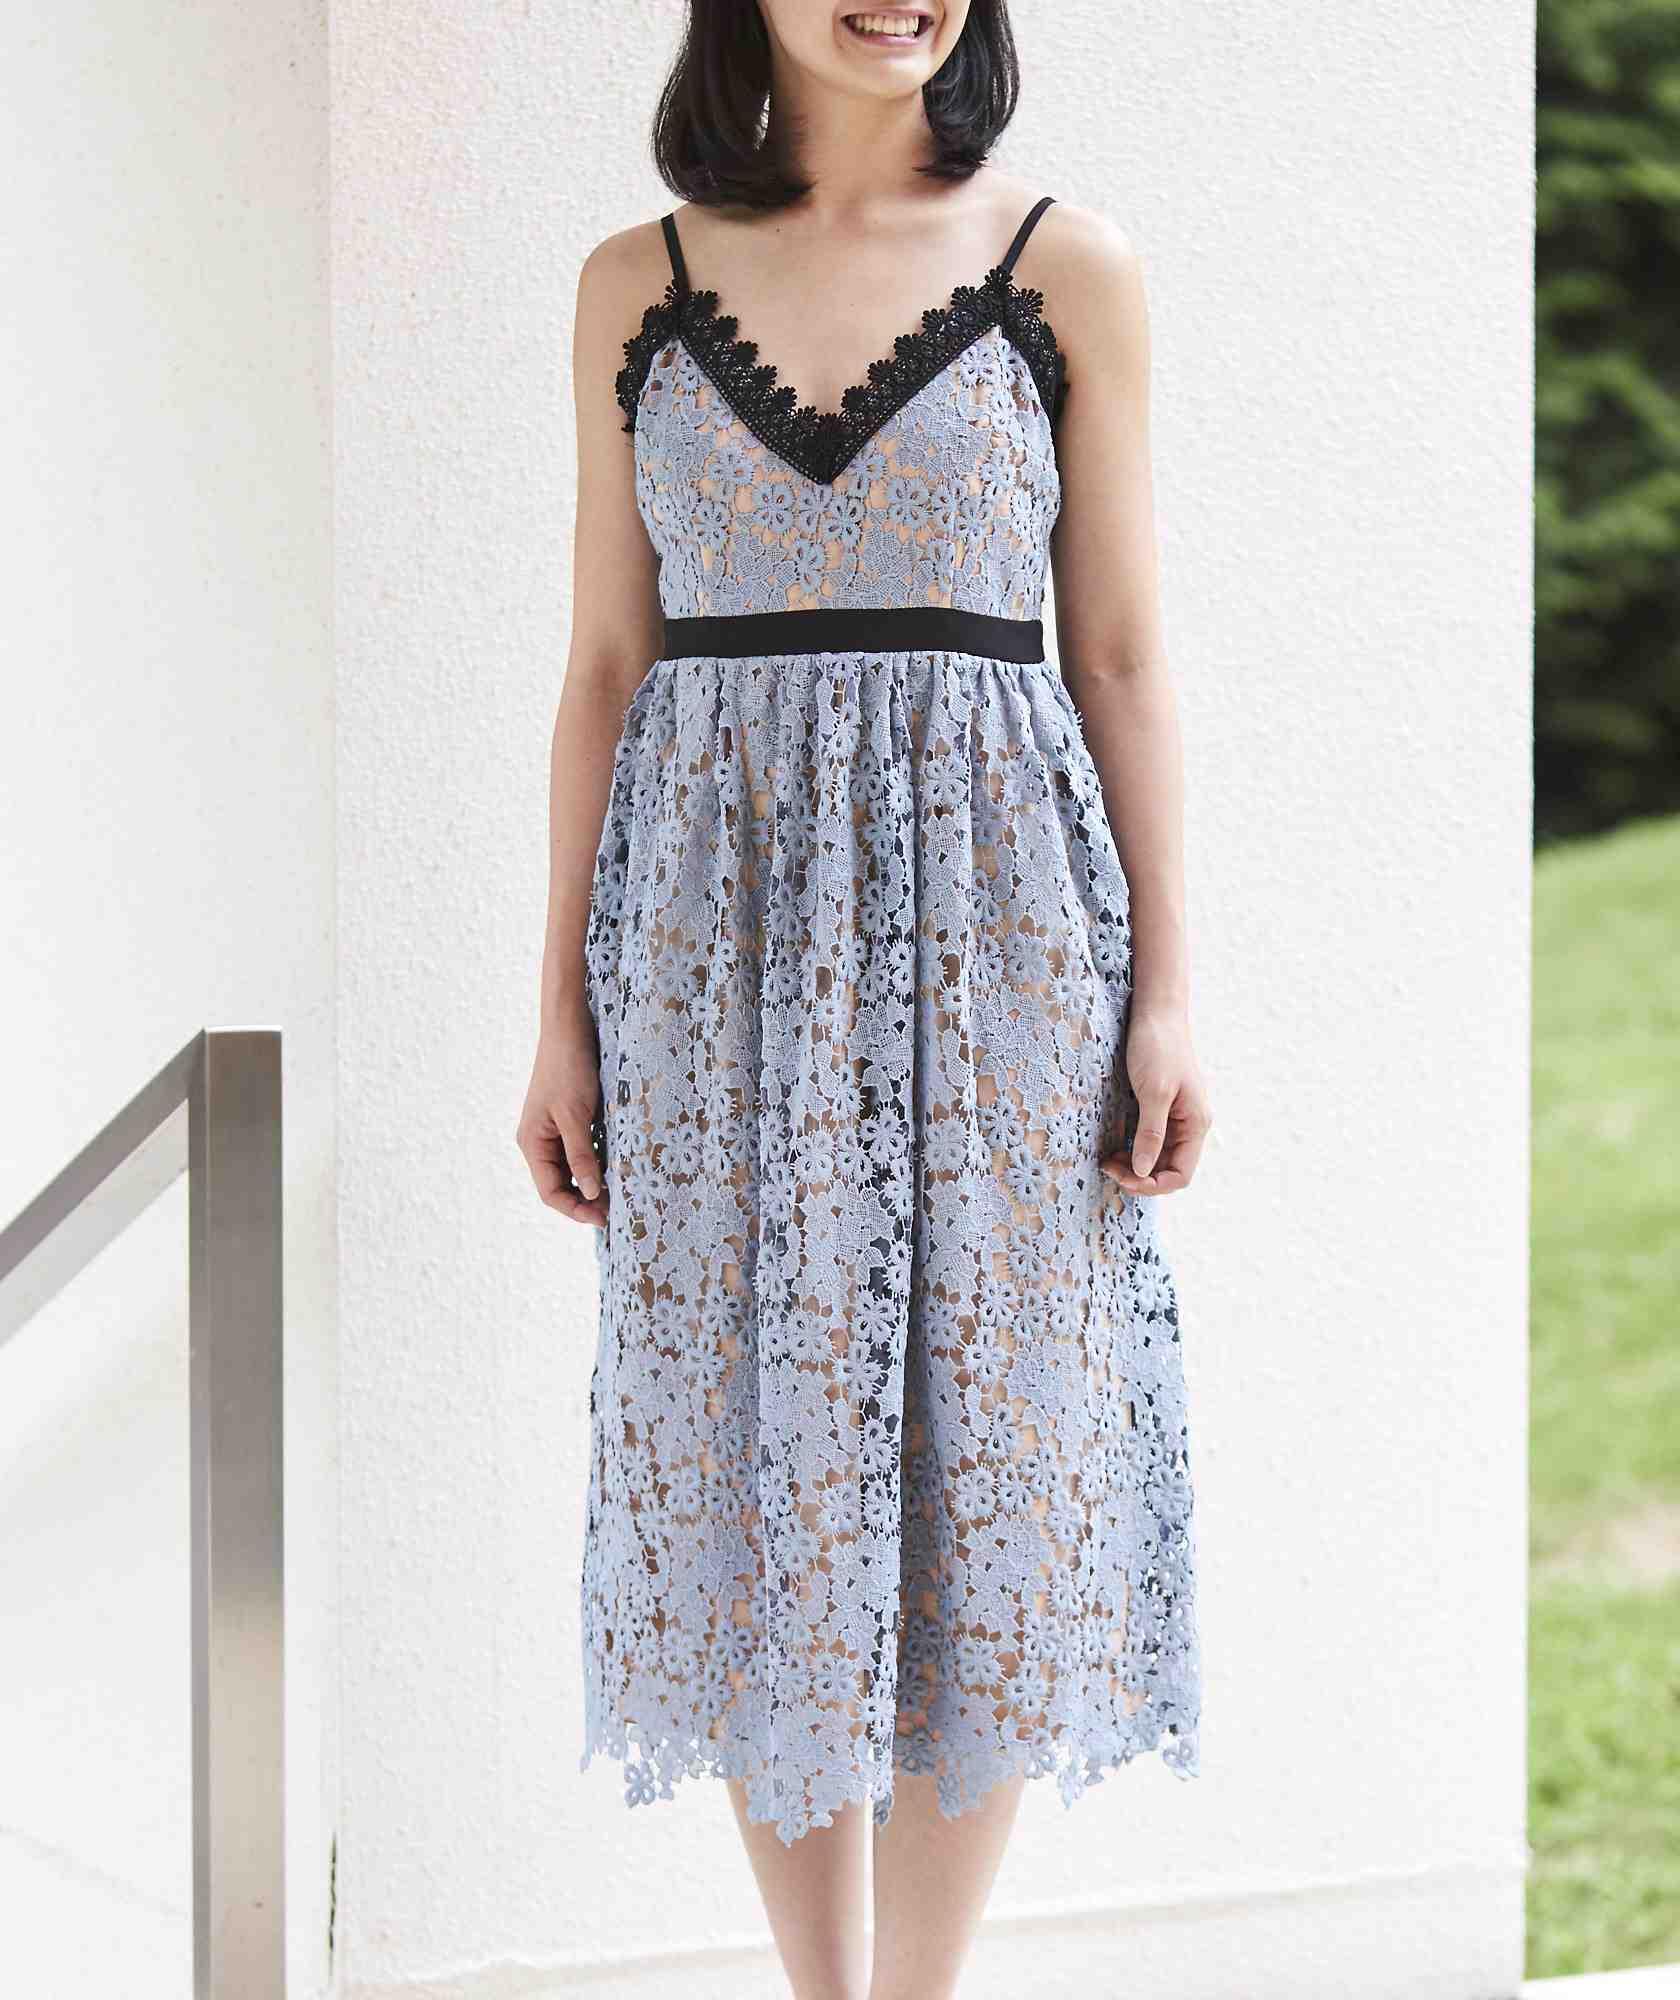 Aラインストラップショルダーフルレースミディアムドレス-ブルー-M